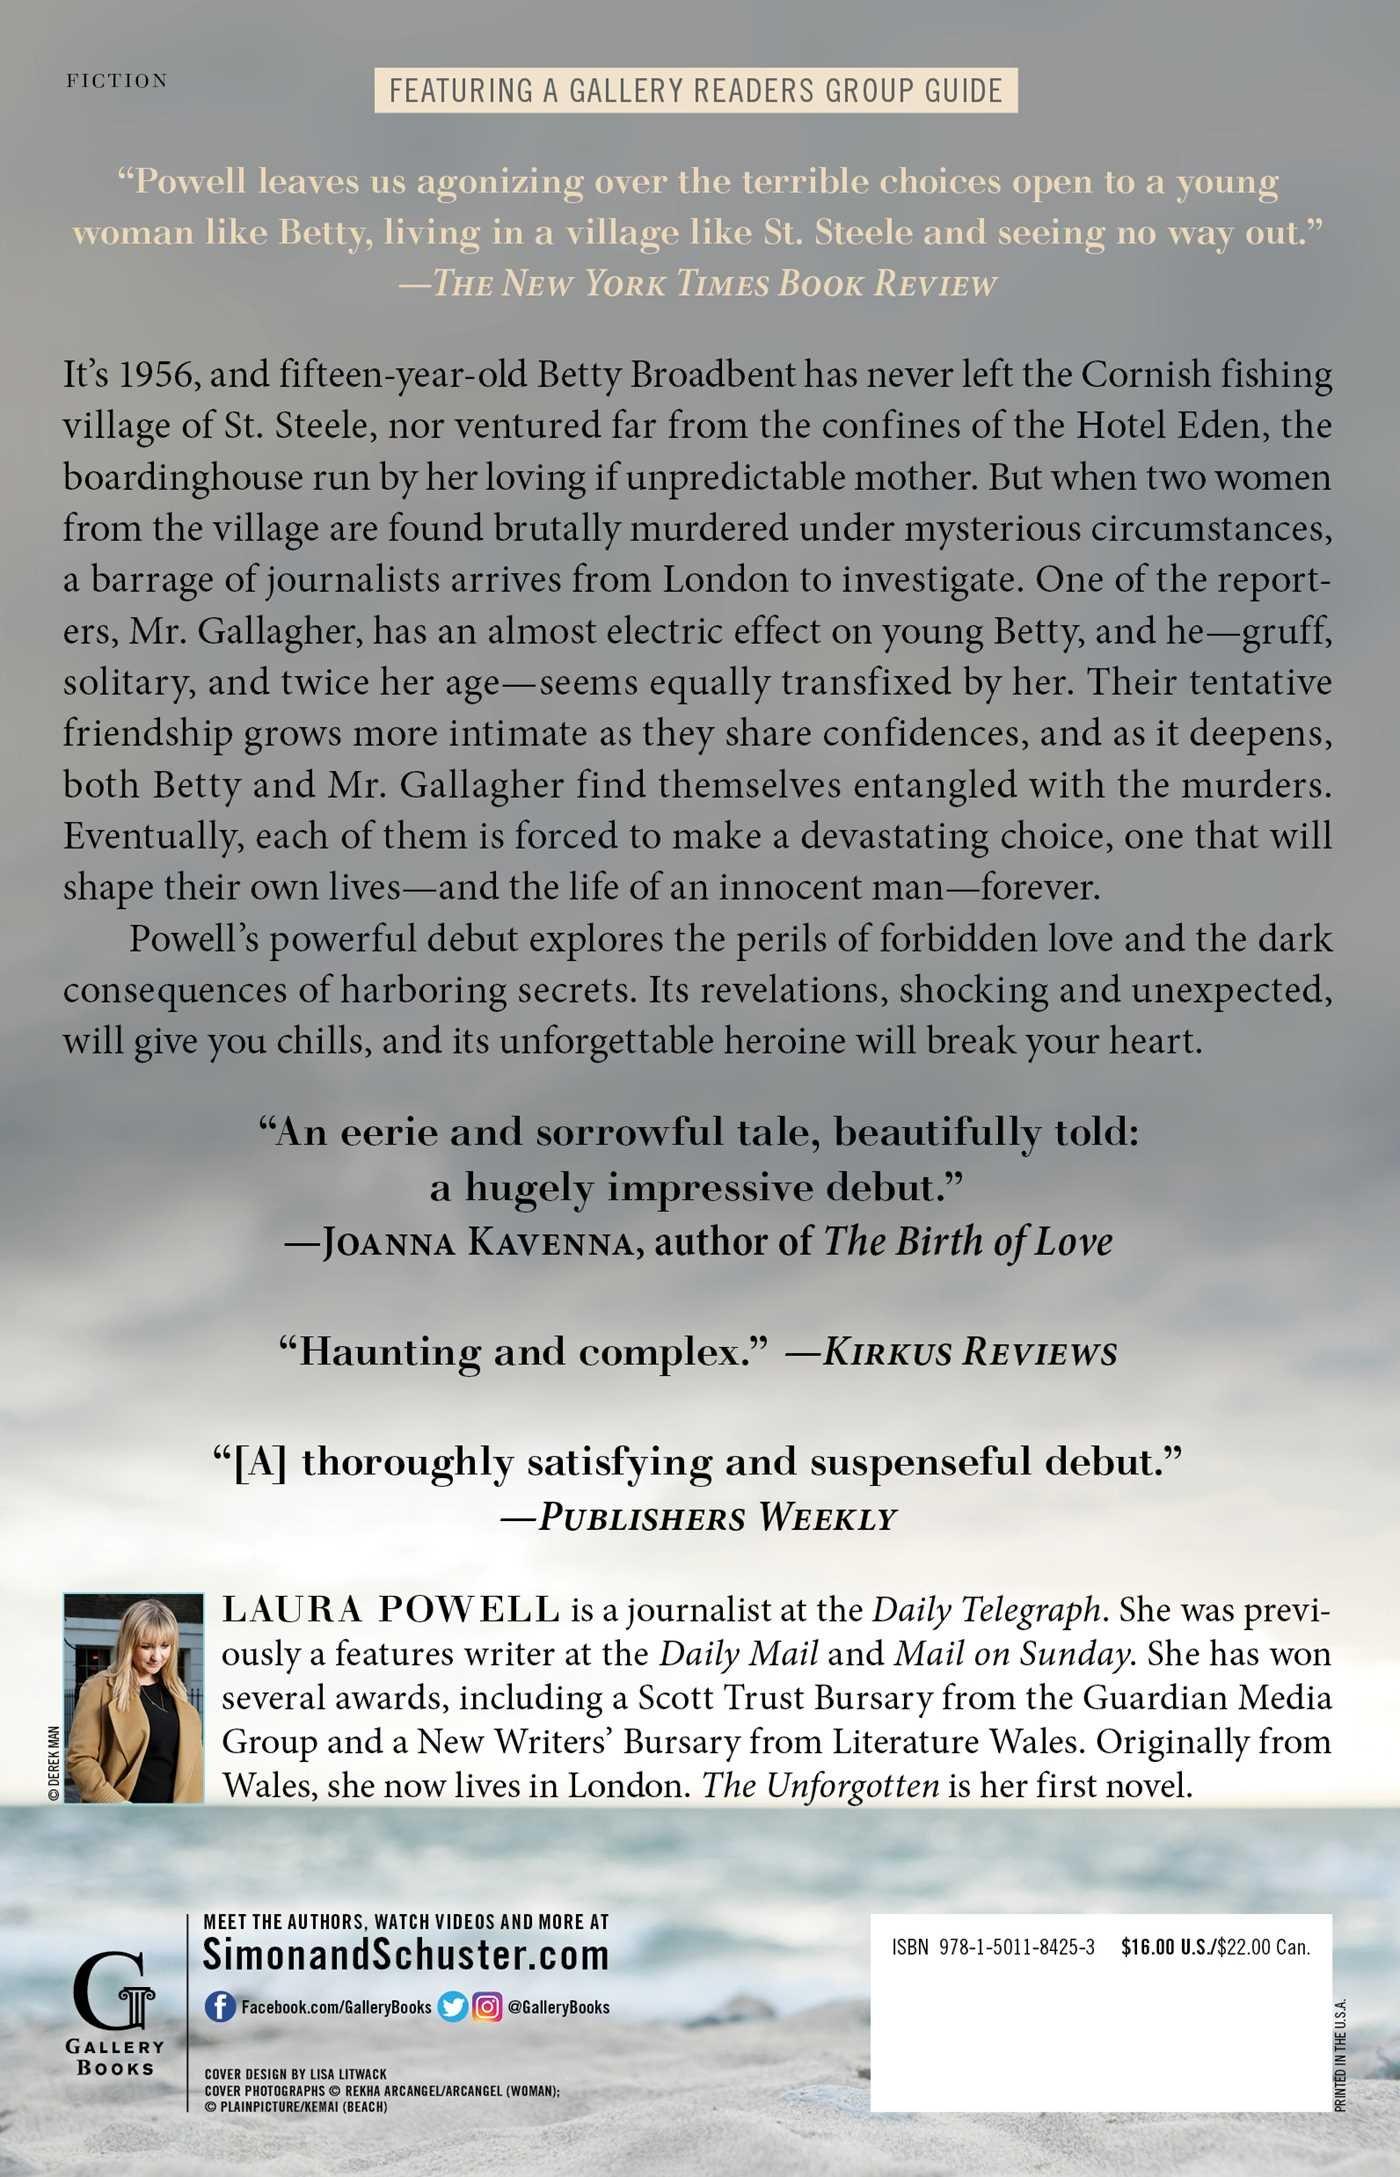 Amazon com: The Unforgotten: A Novel (9781501184253): Laura